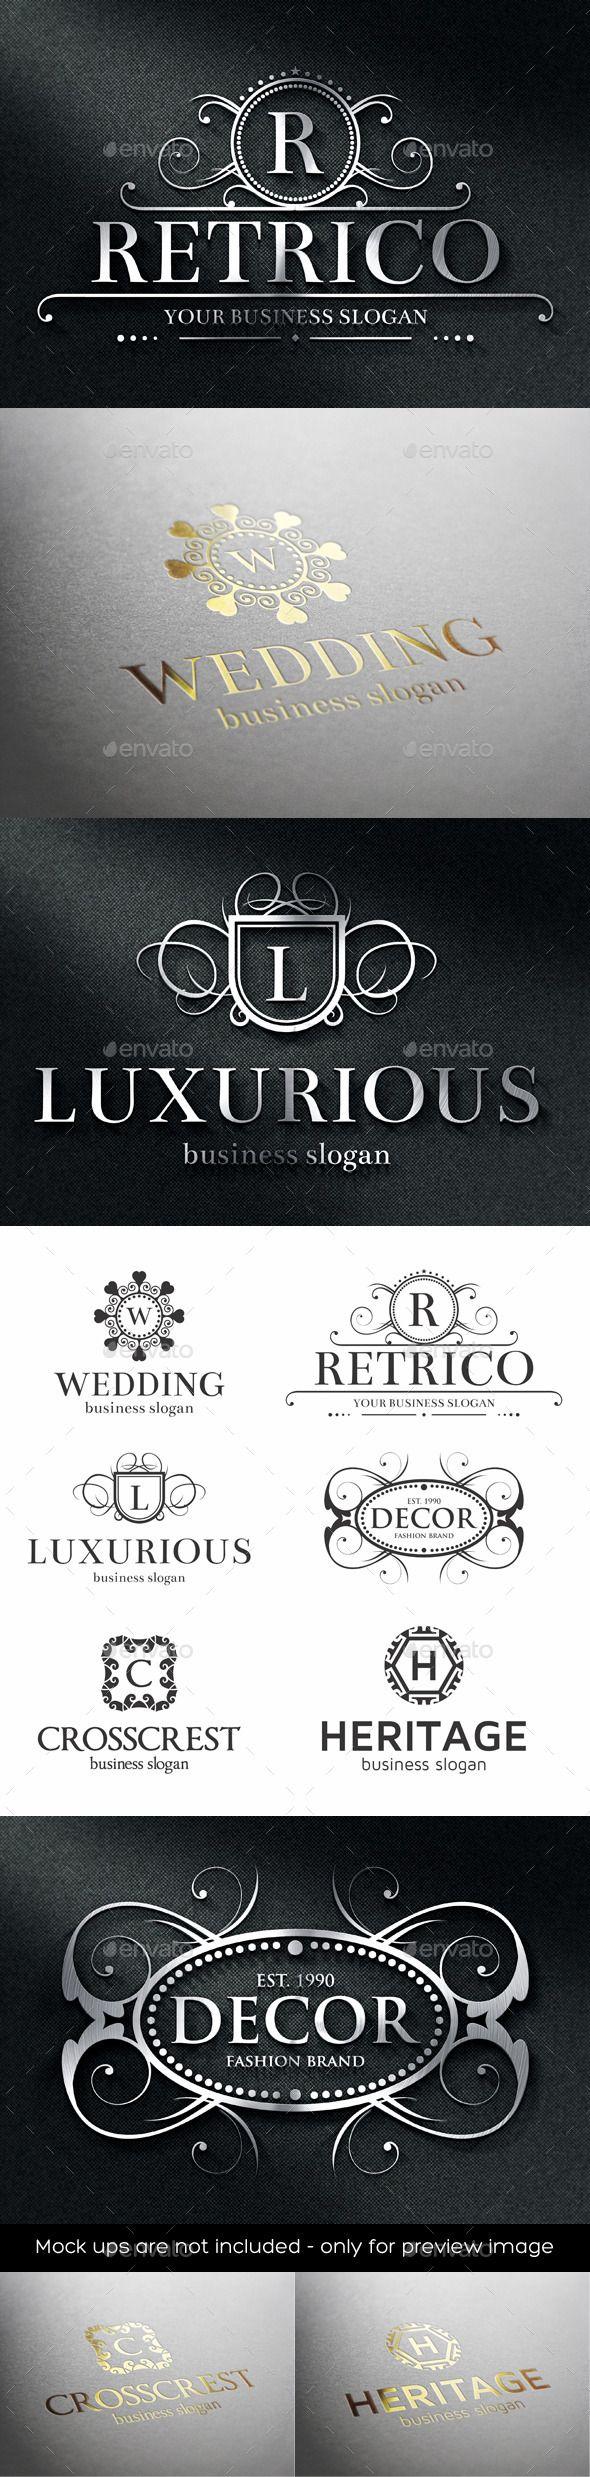 Luxurious Crest Logos Template #design Download: http://graphicriver.net/item/luxurious-crest-logos/12130679?ref=ksioks